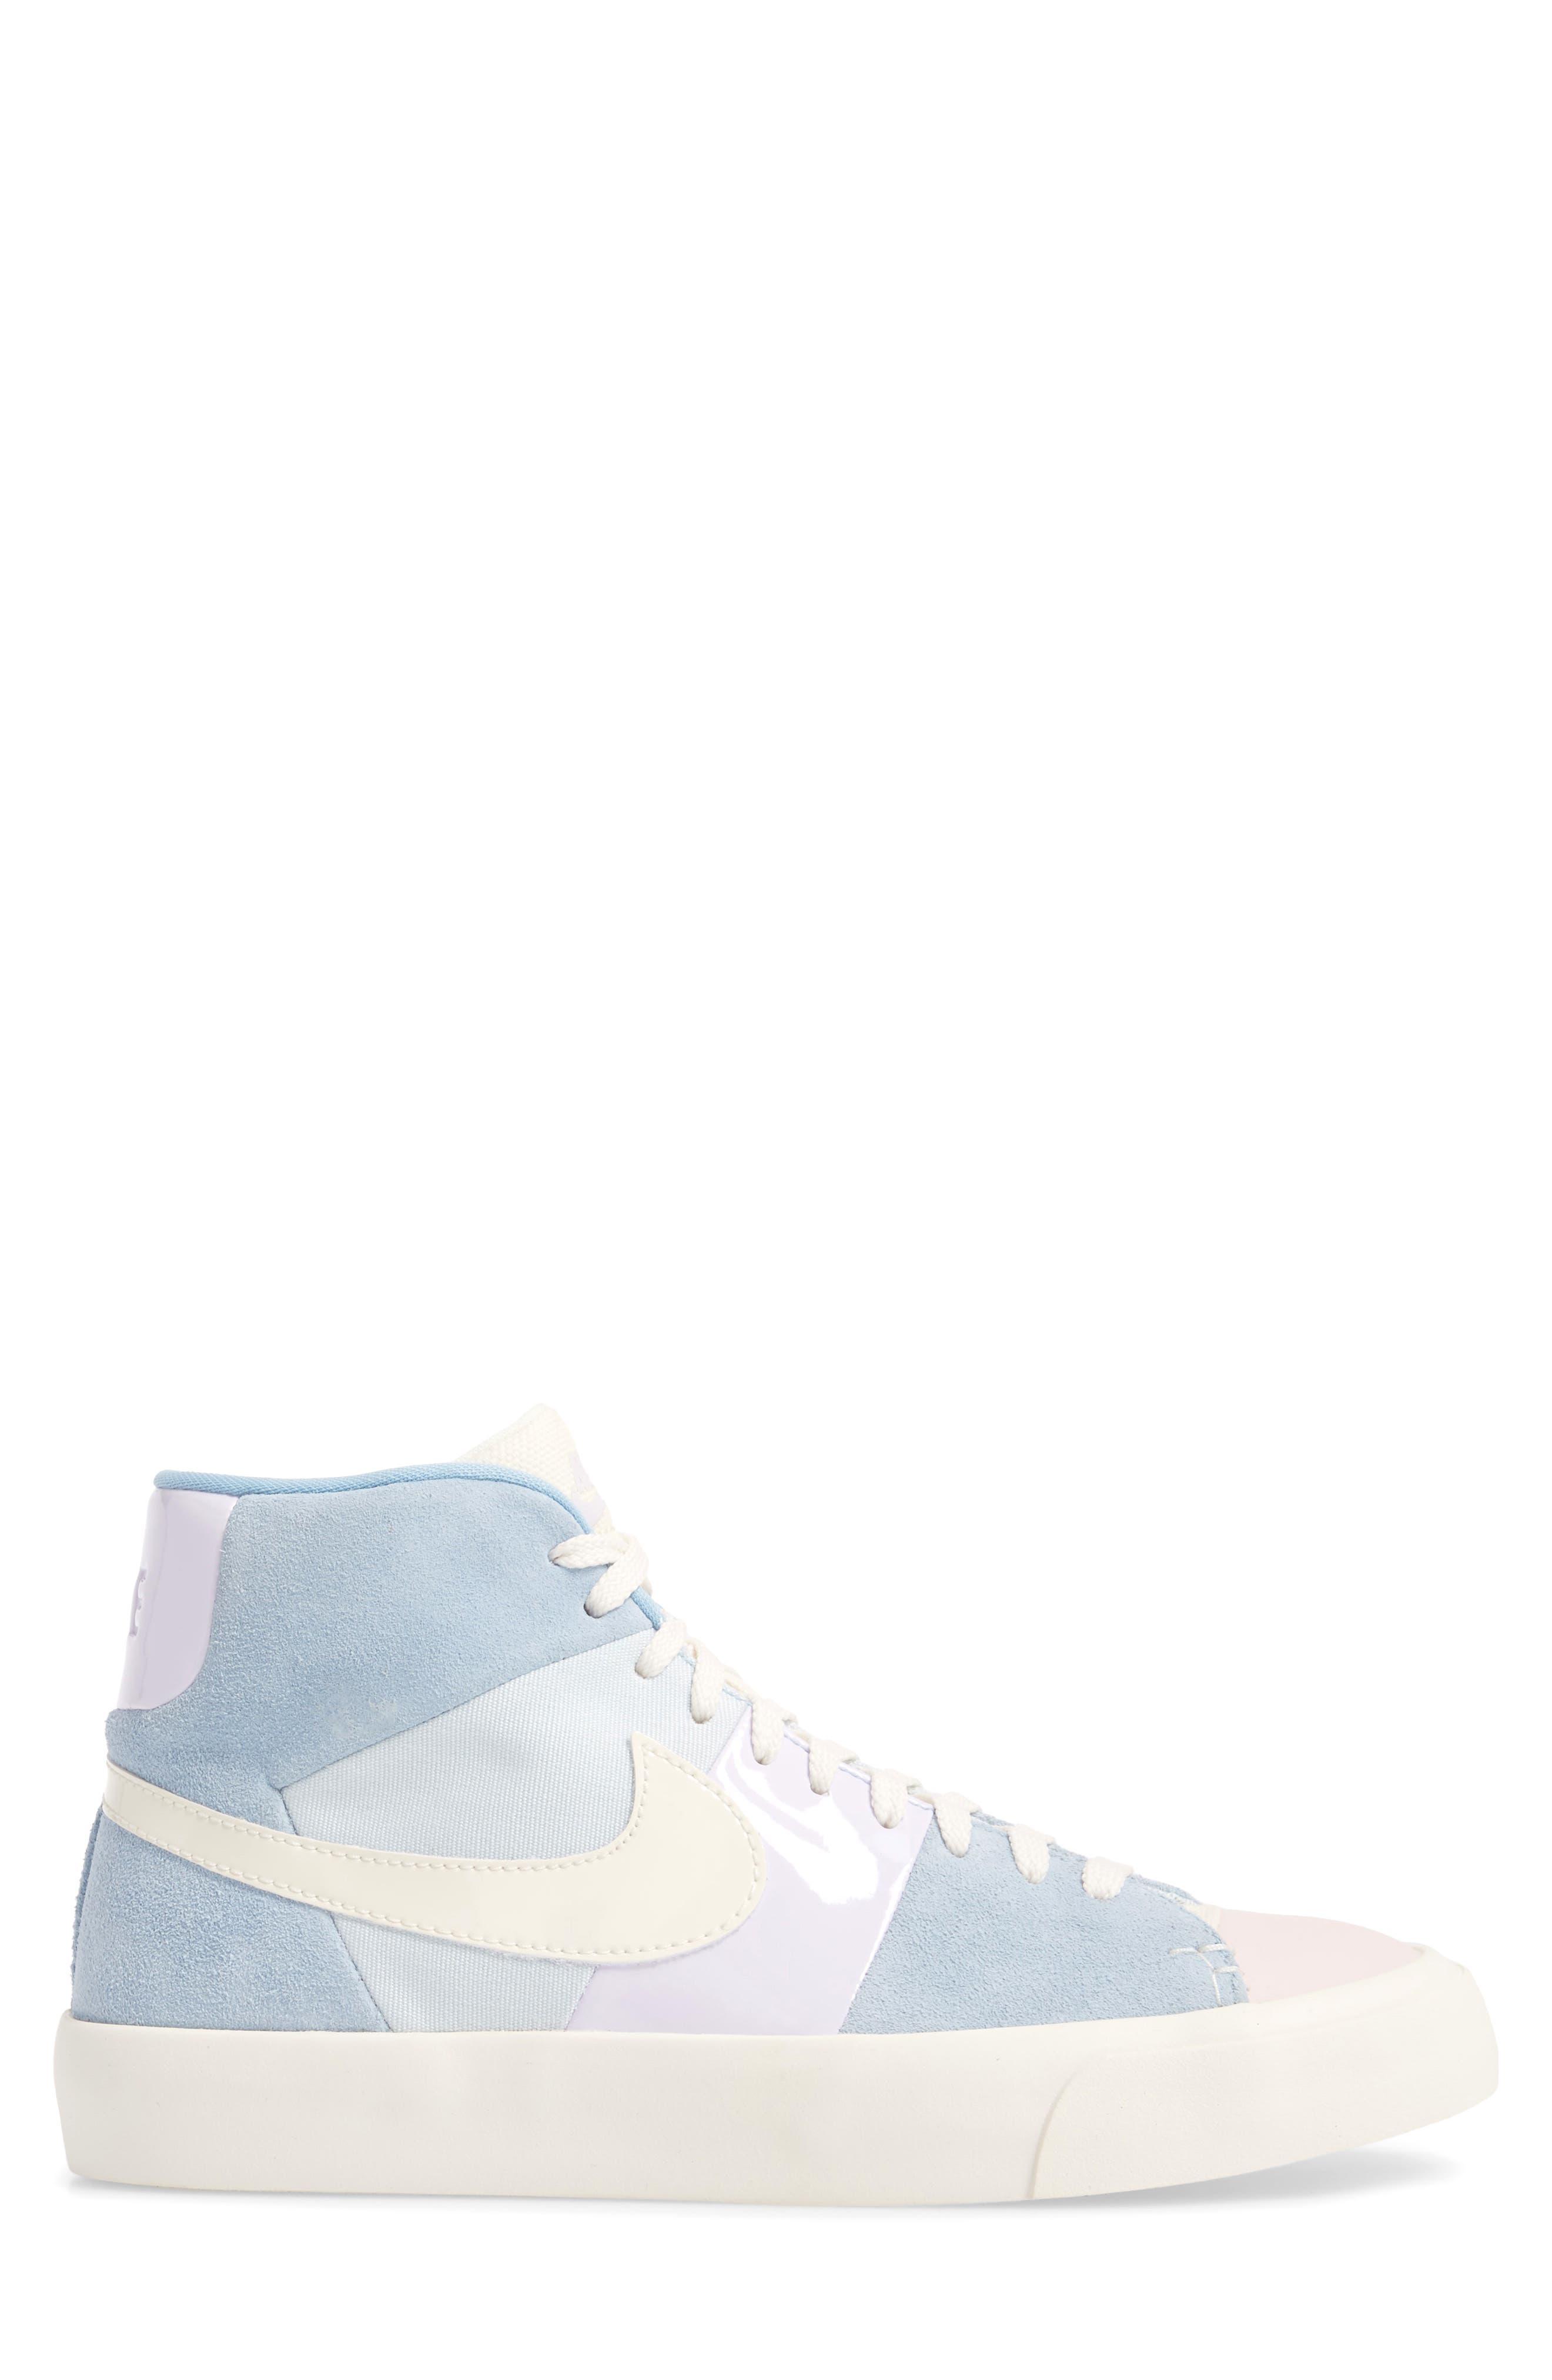 Blazer Royal Easter QS High Top Sneaker,                             Alternate thumbnail 3, color,                             Arctic Pink/ Sail-Blue-Blue